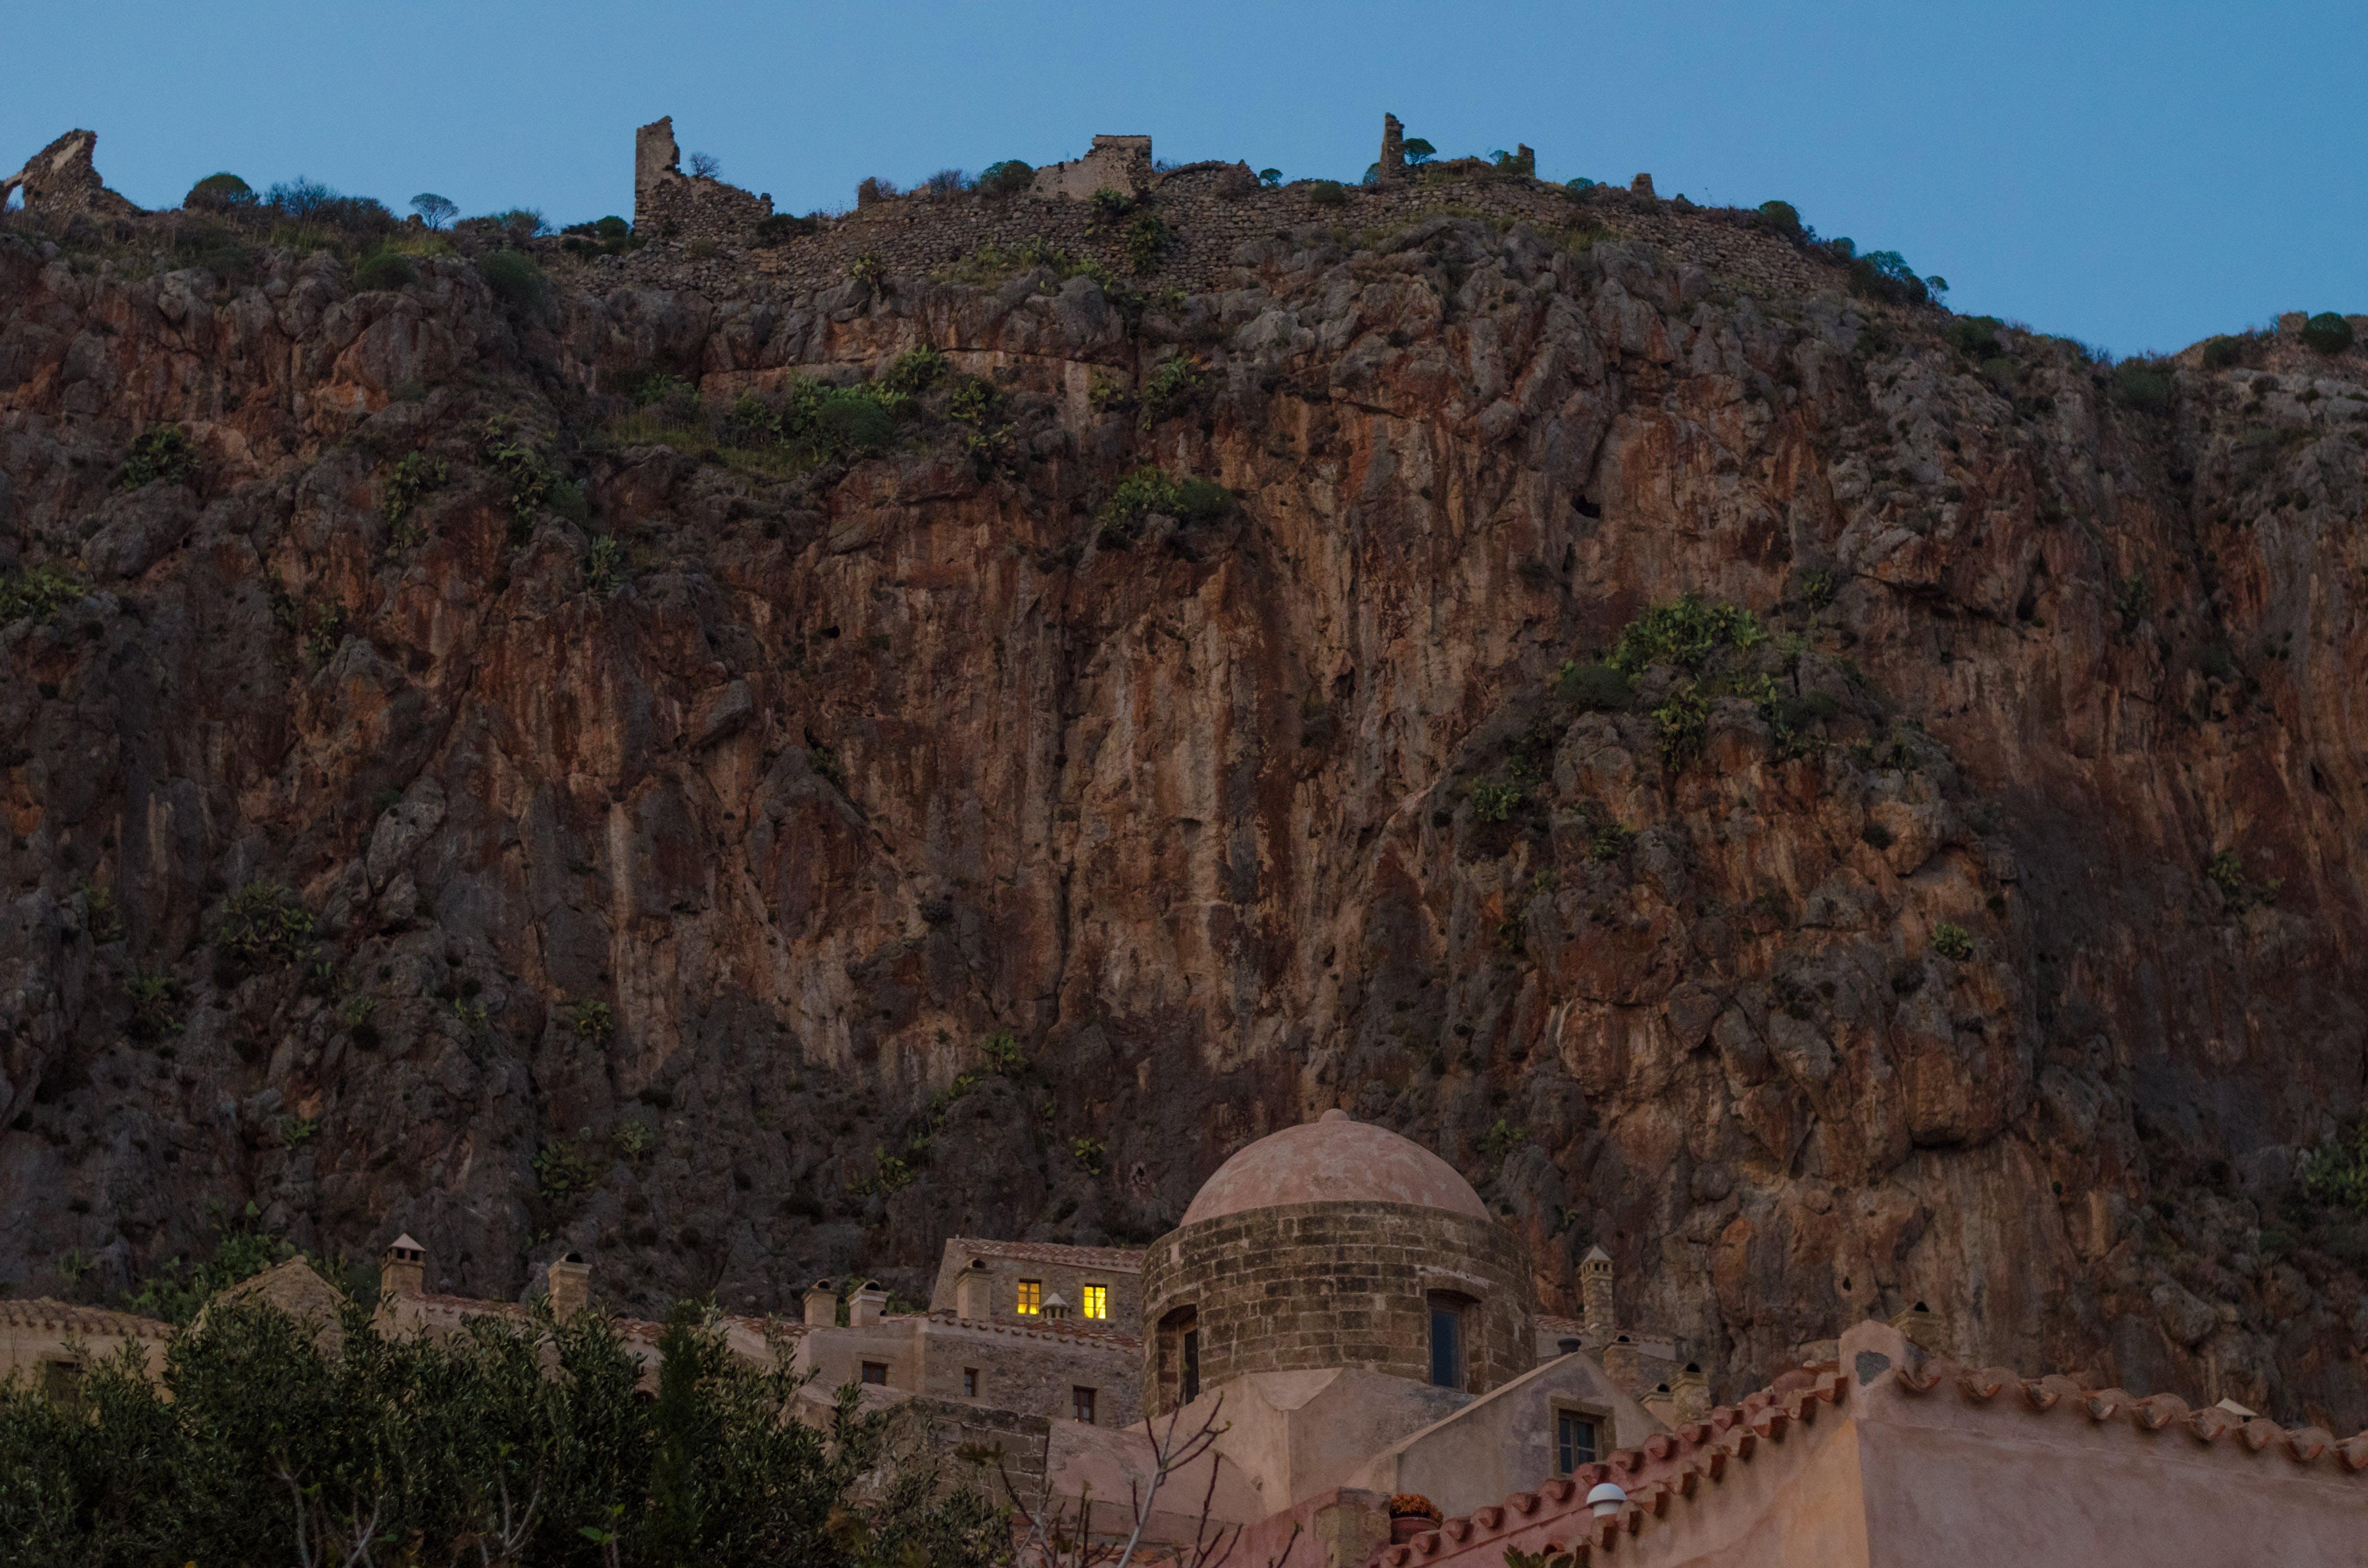 church, mountain, village